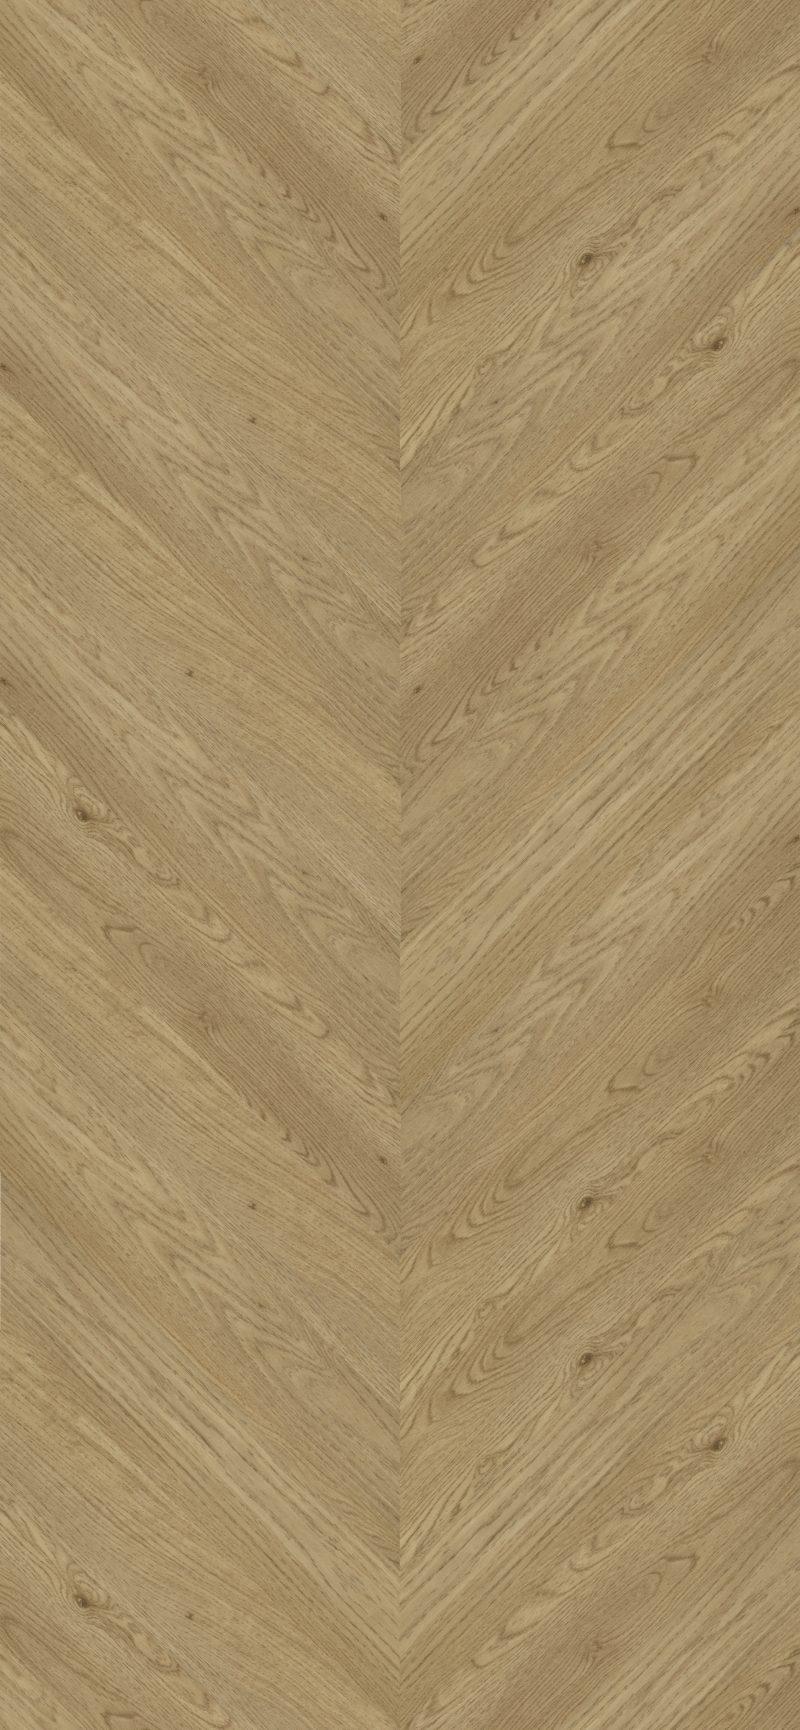 Vinilinės grindys lentelėmis Forbo Allura Wood waxed oak